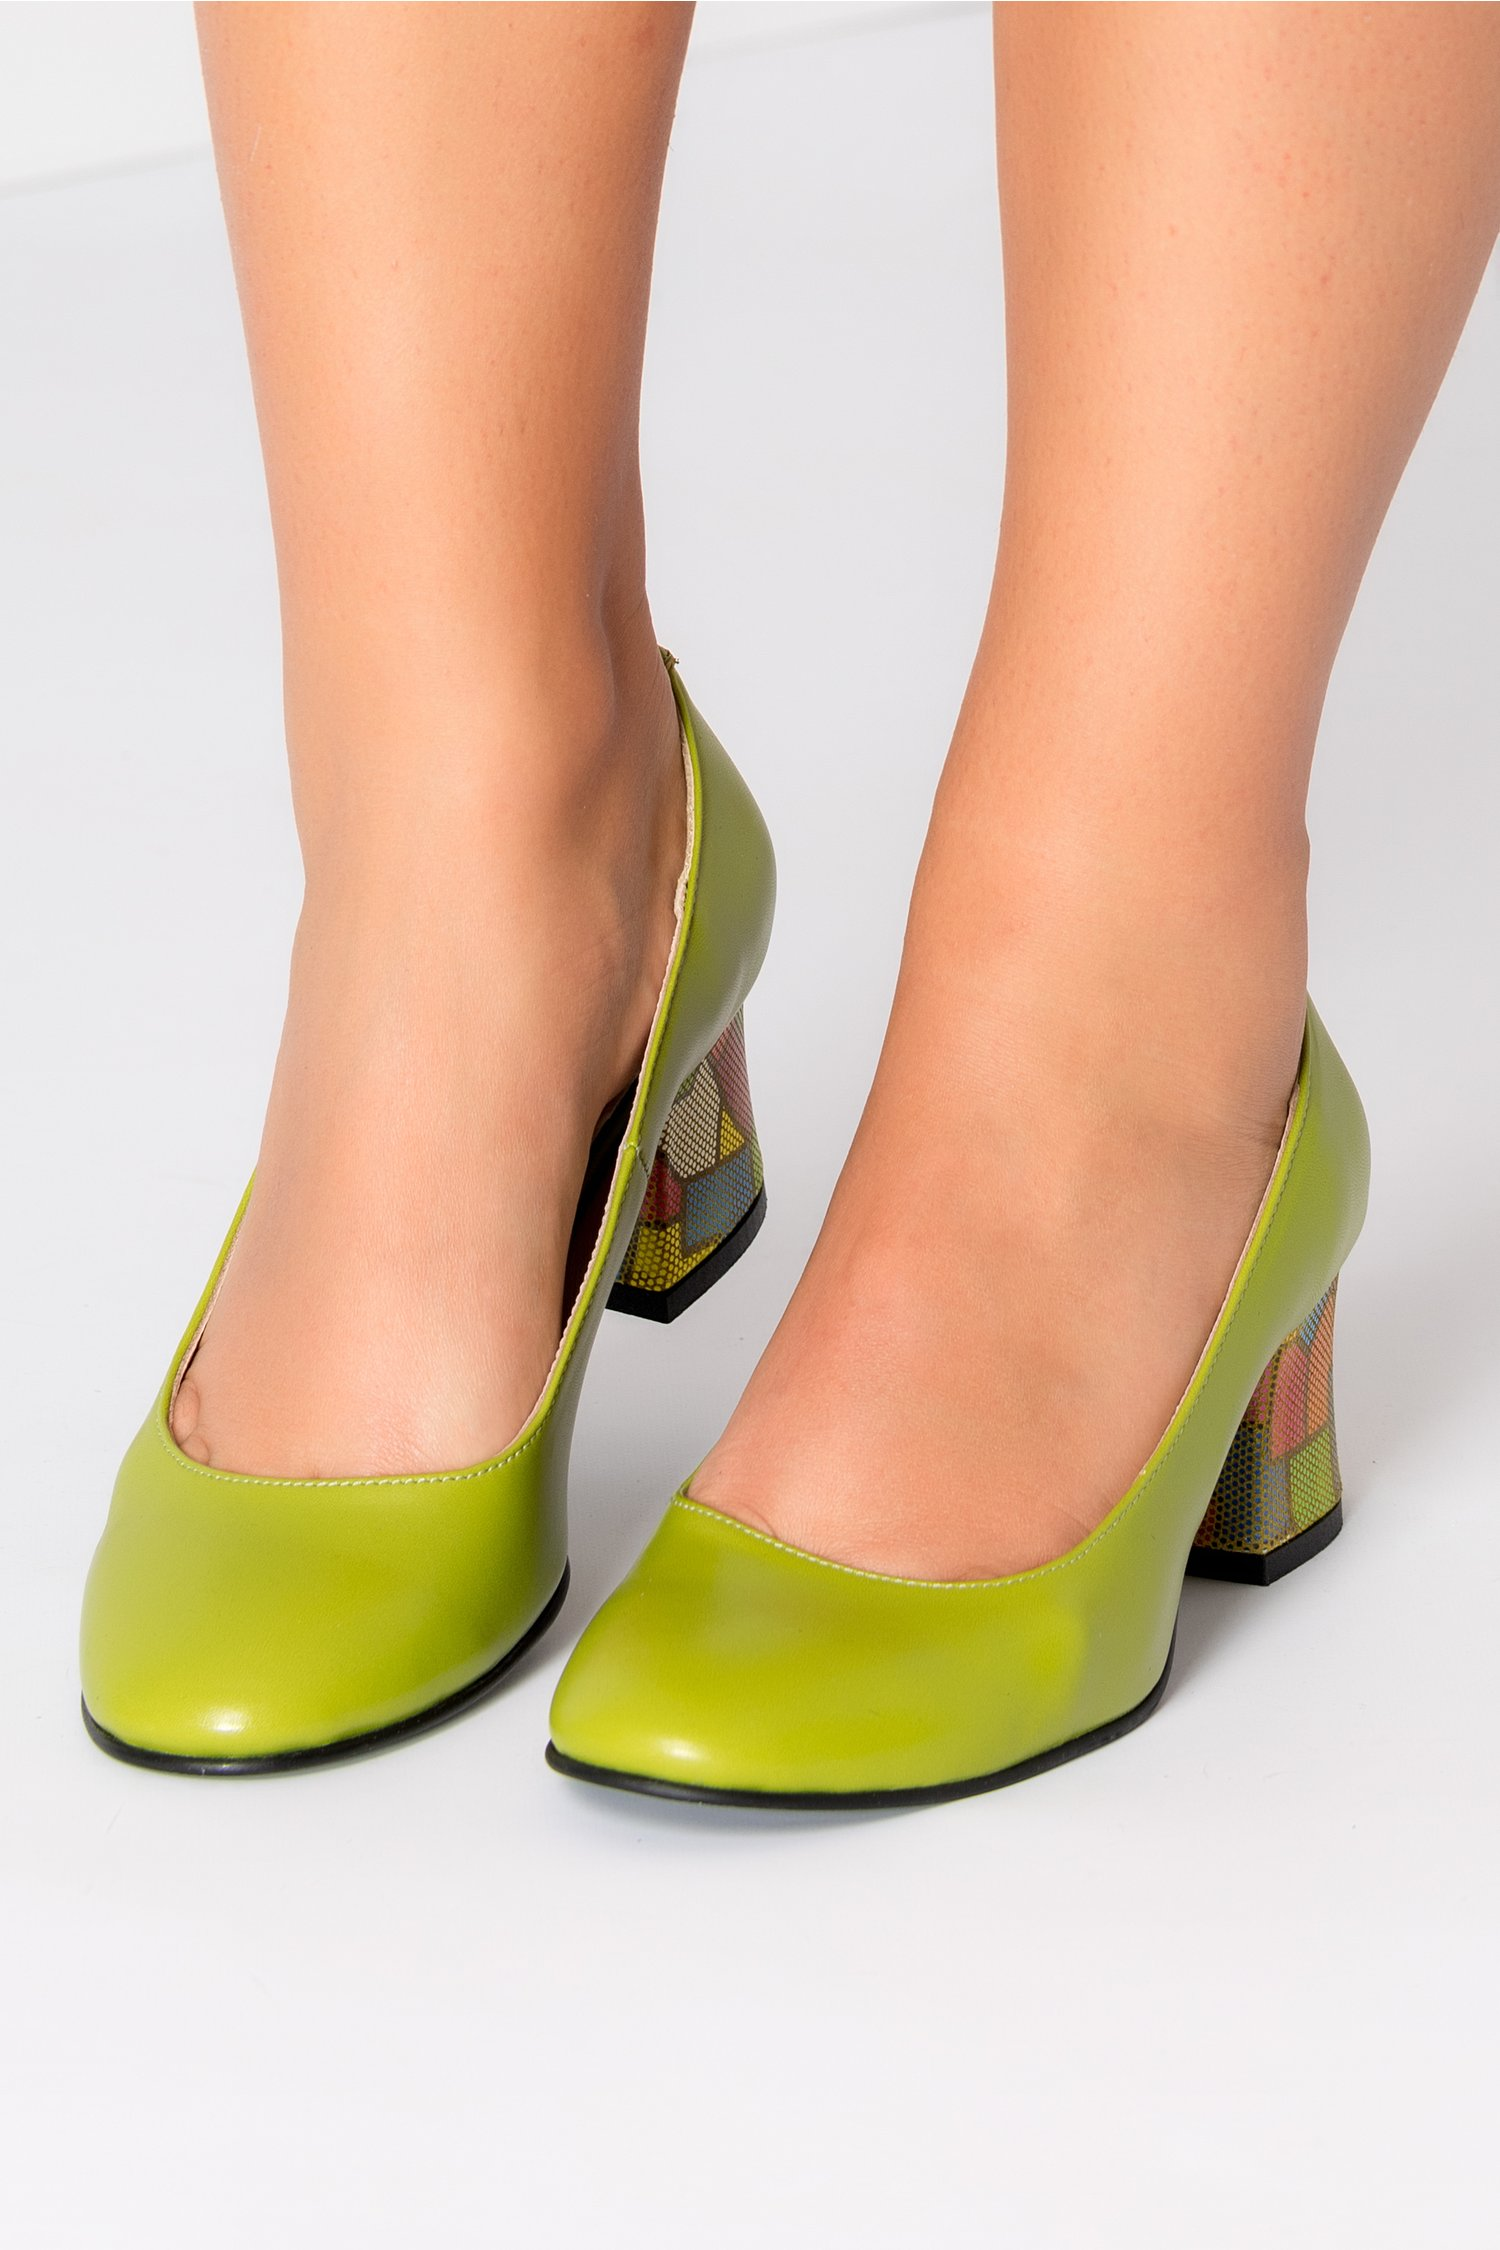 Pantofi Aron verzi office cu toc jos